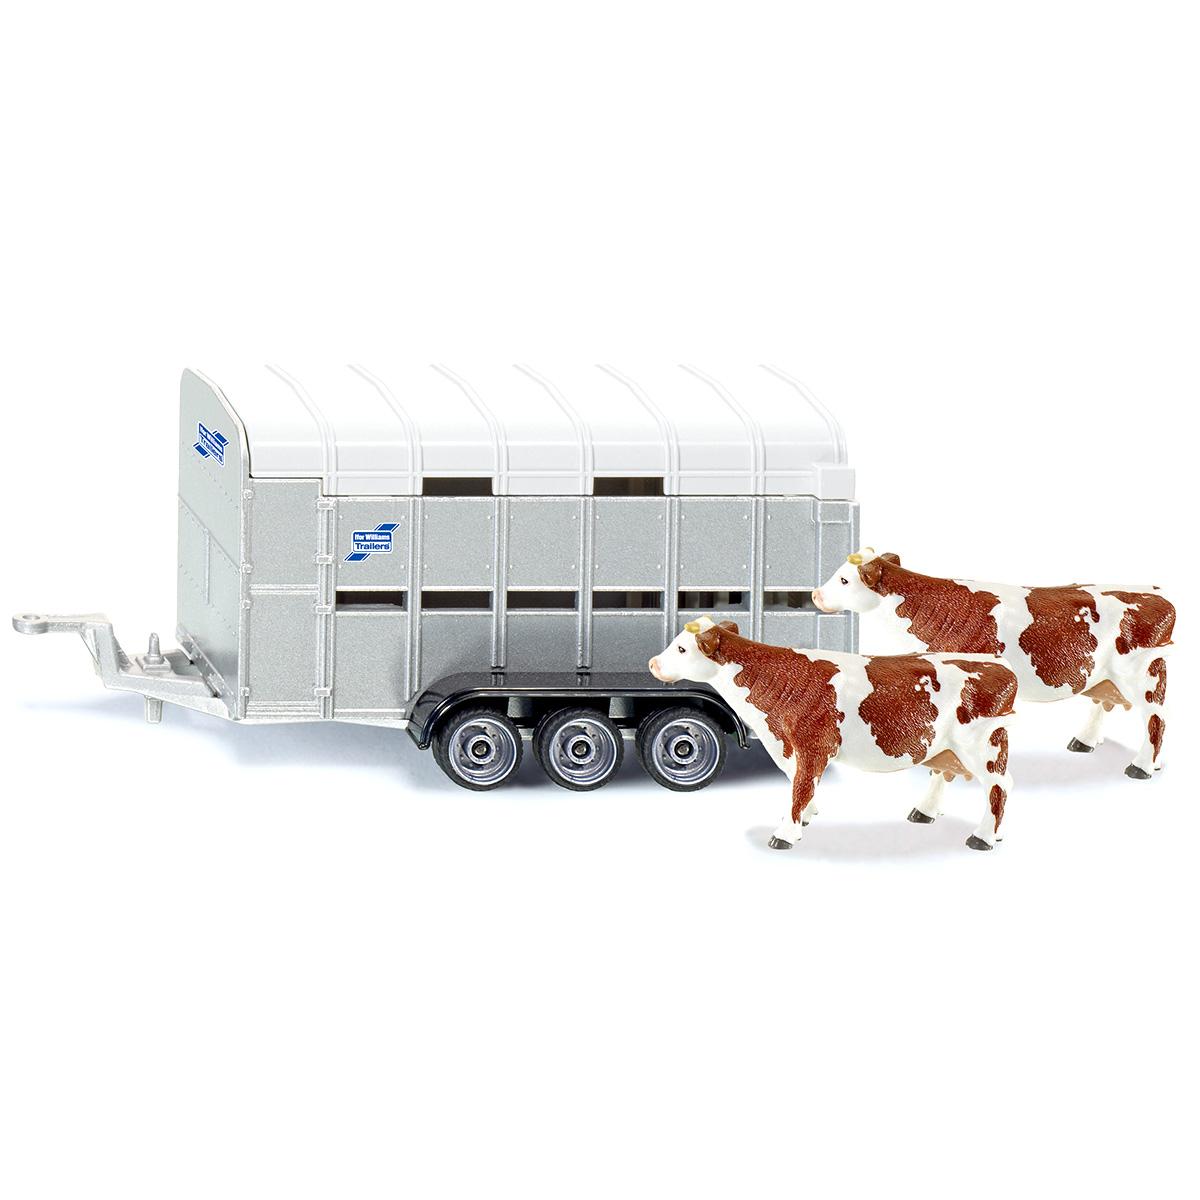 ファーマー 大型家畜運搬車 1/32(ジク・SIKU)